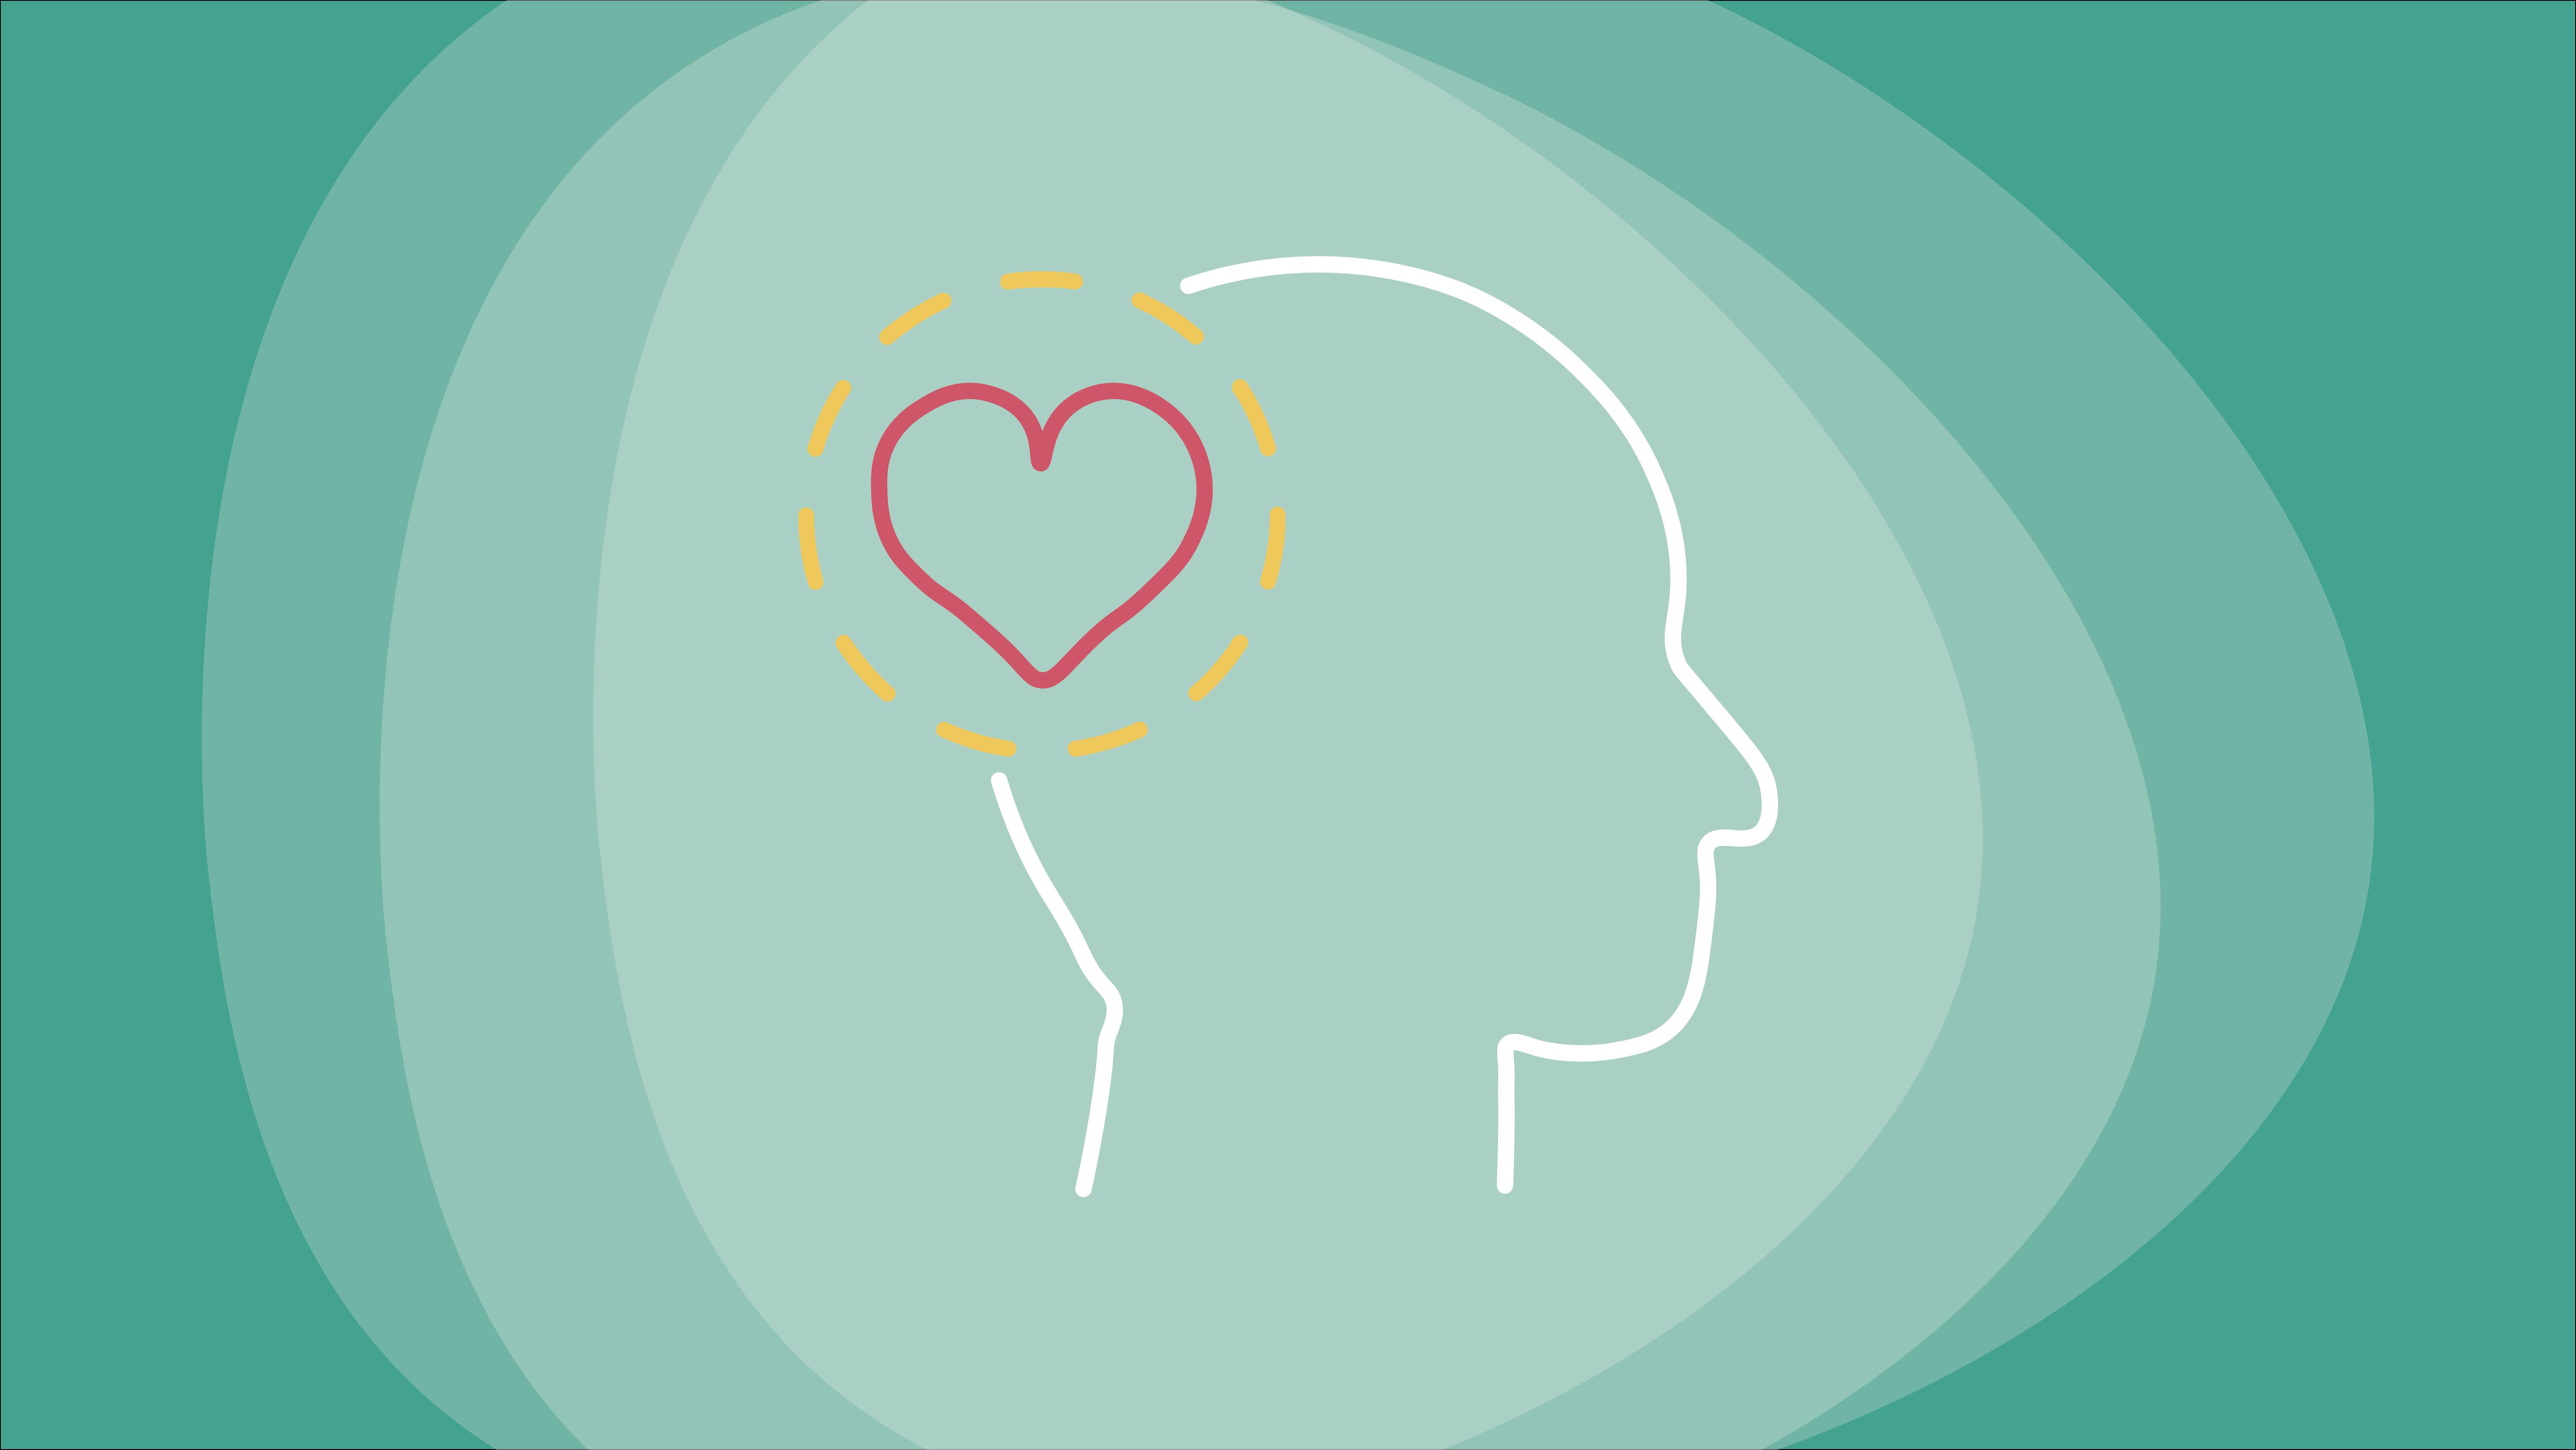 importance of teacher wellbeing